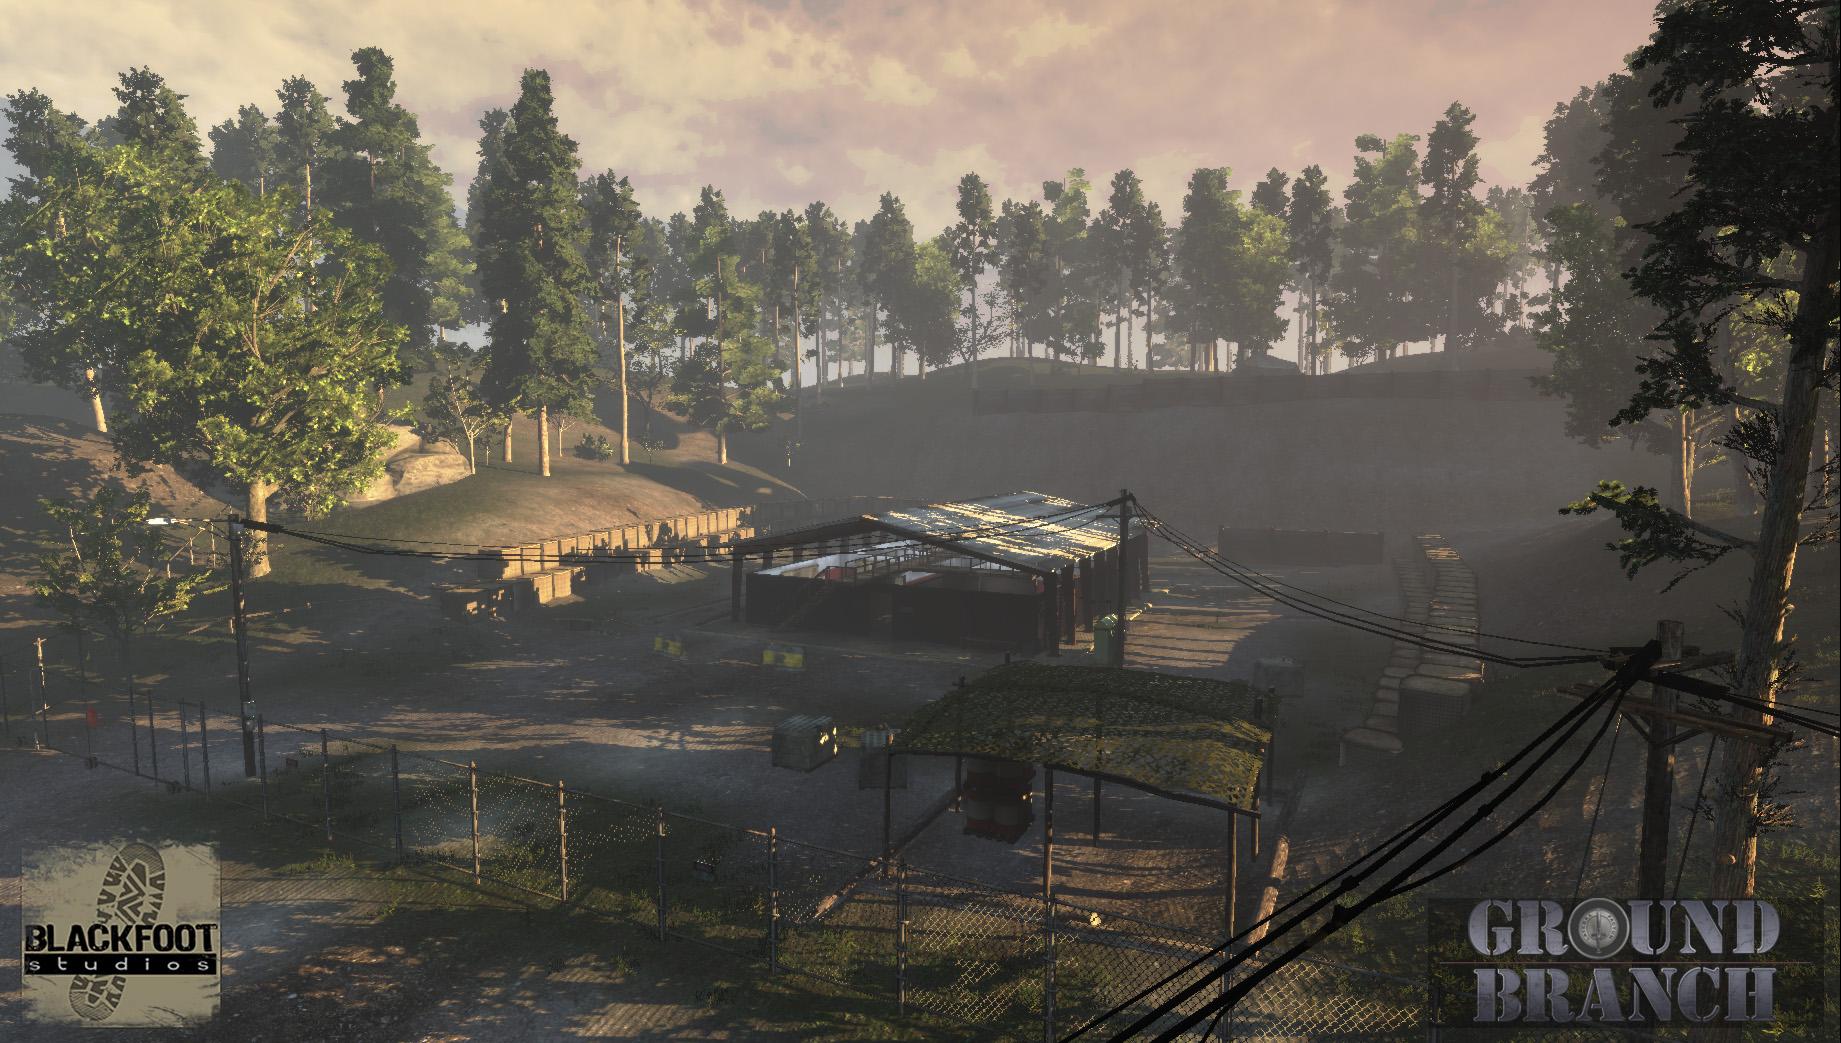 Ground Branch screenshot 3